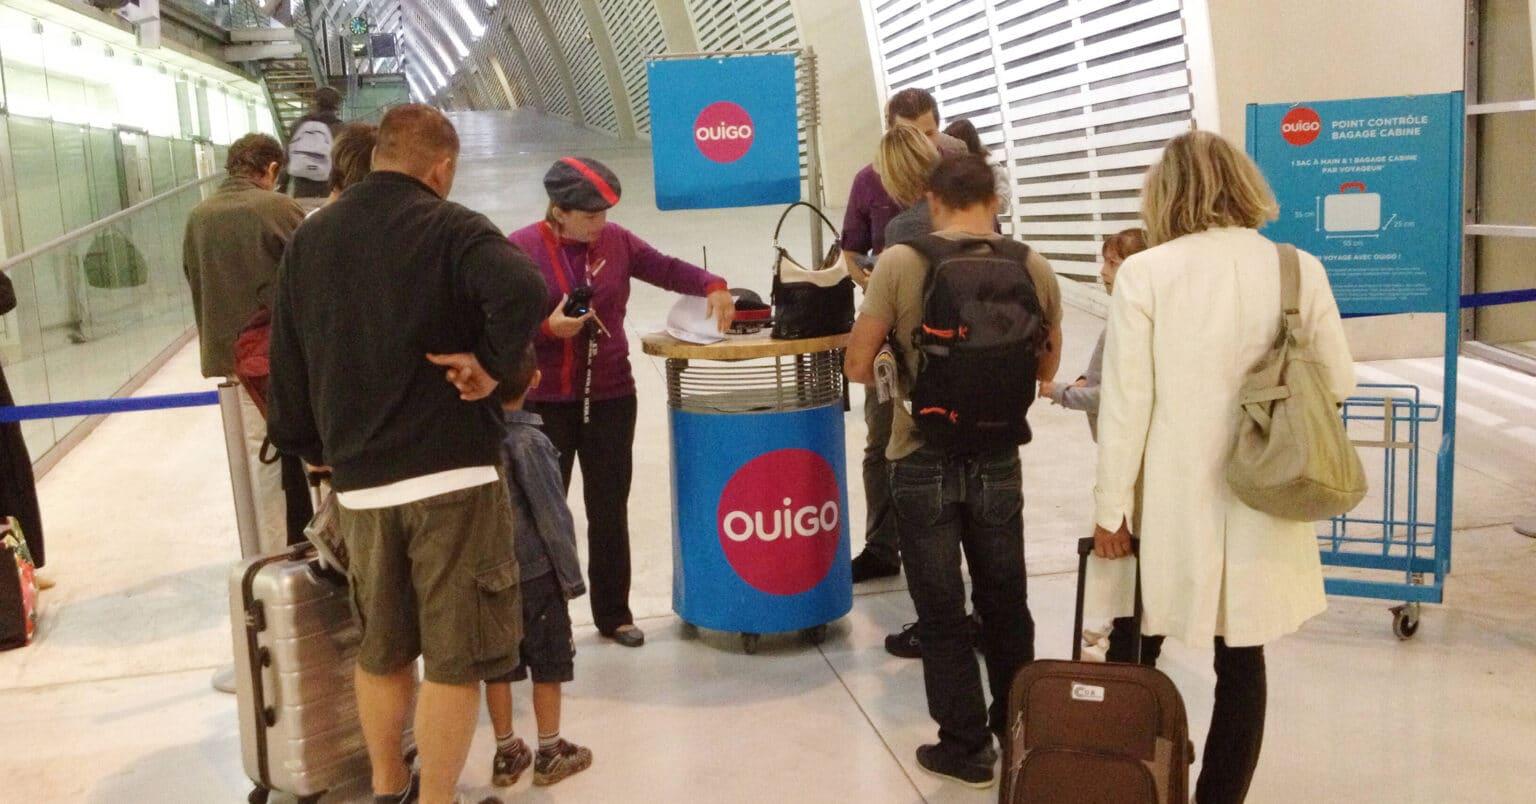 Oferta de empleo para tripulación de servicios en Ouigo. Foto: jean-louis Zimmermann